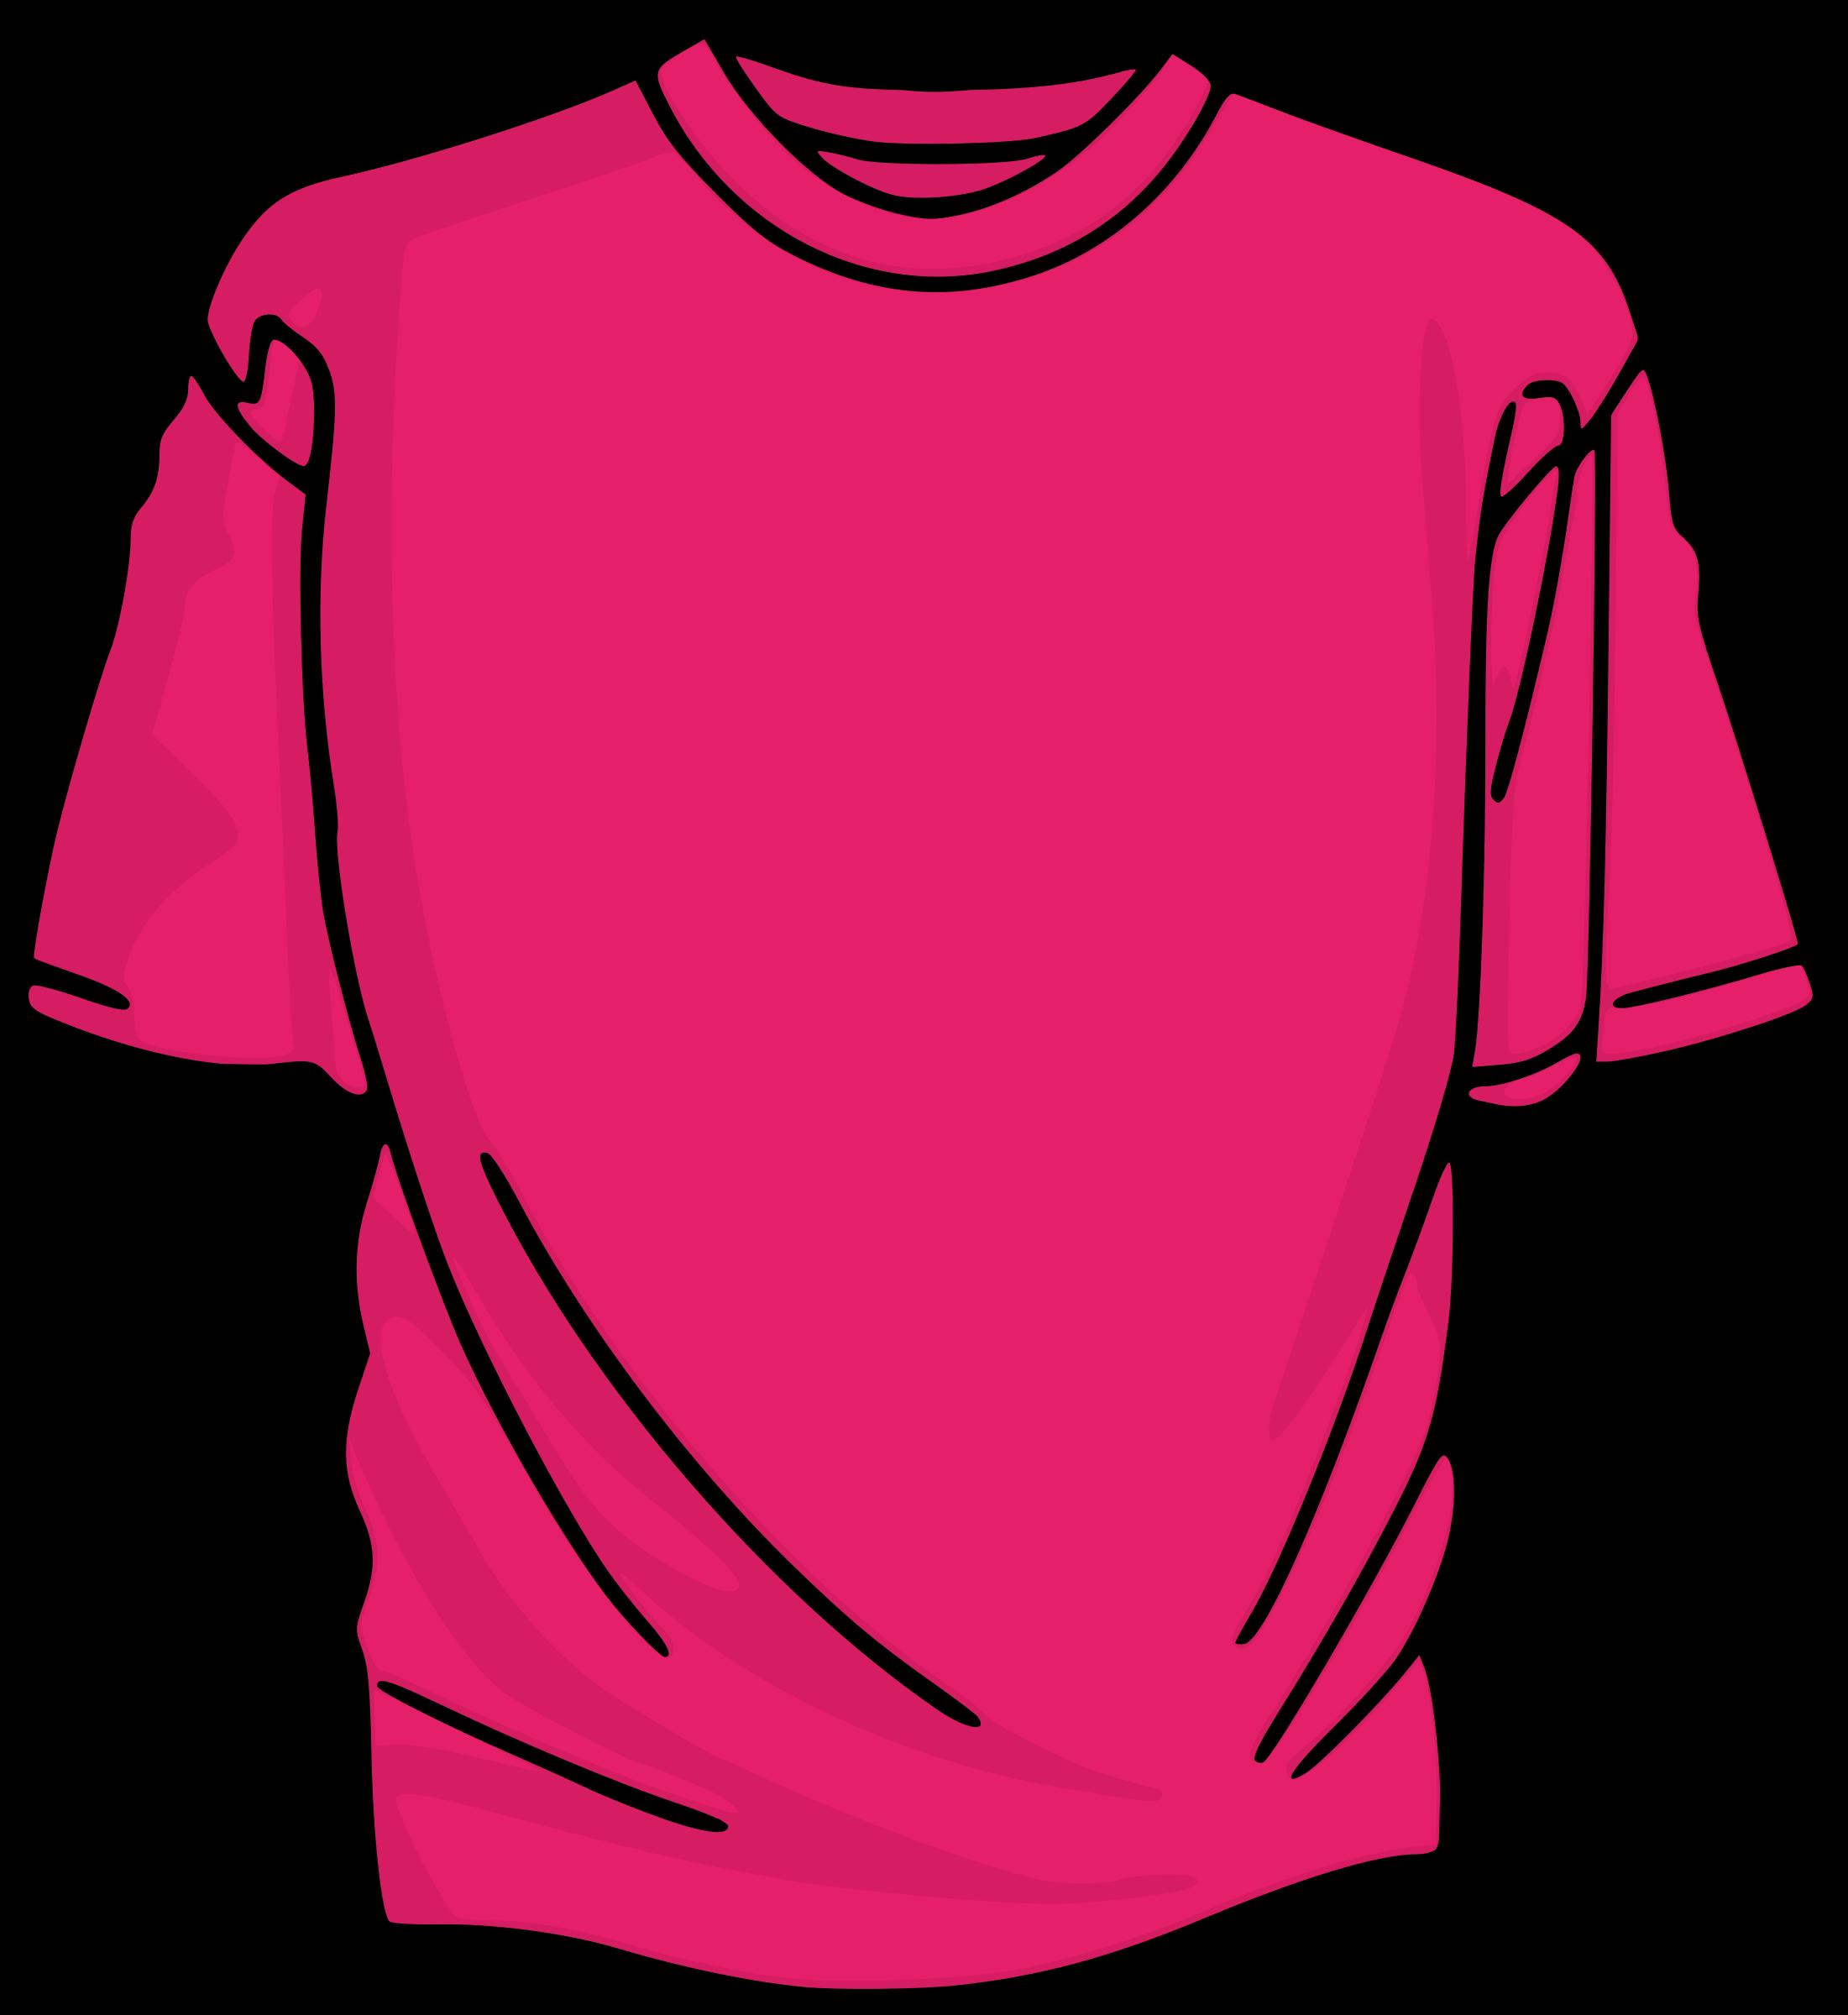 Shirt shirt clip art designs free clipart images clipartcow